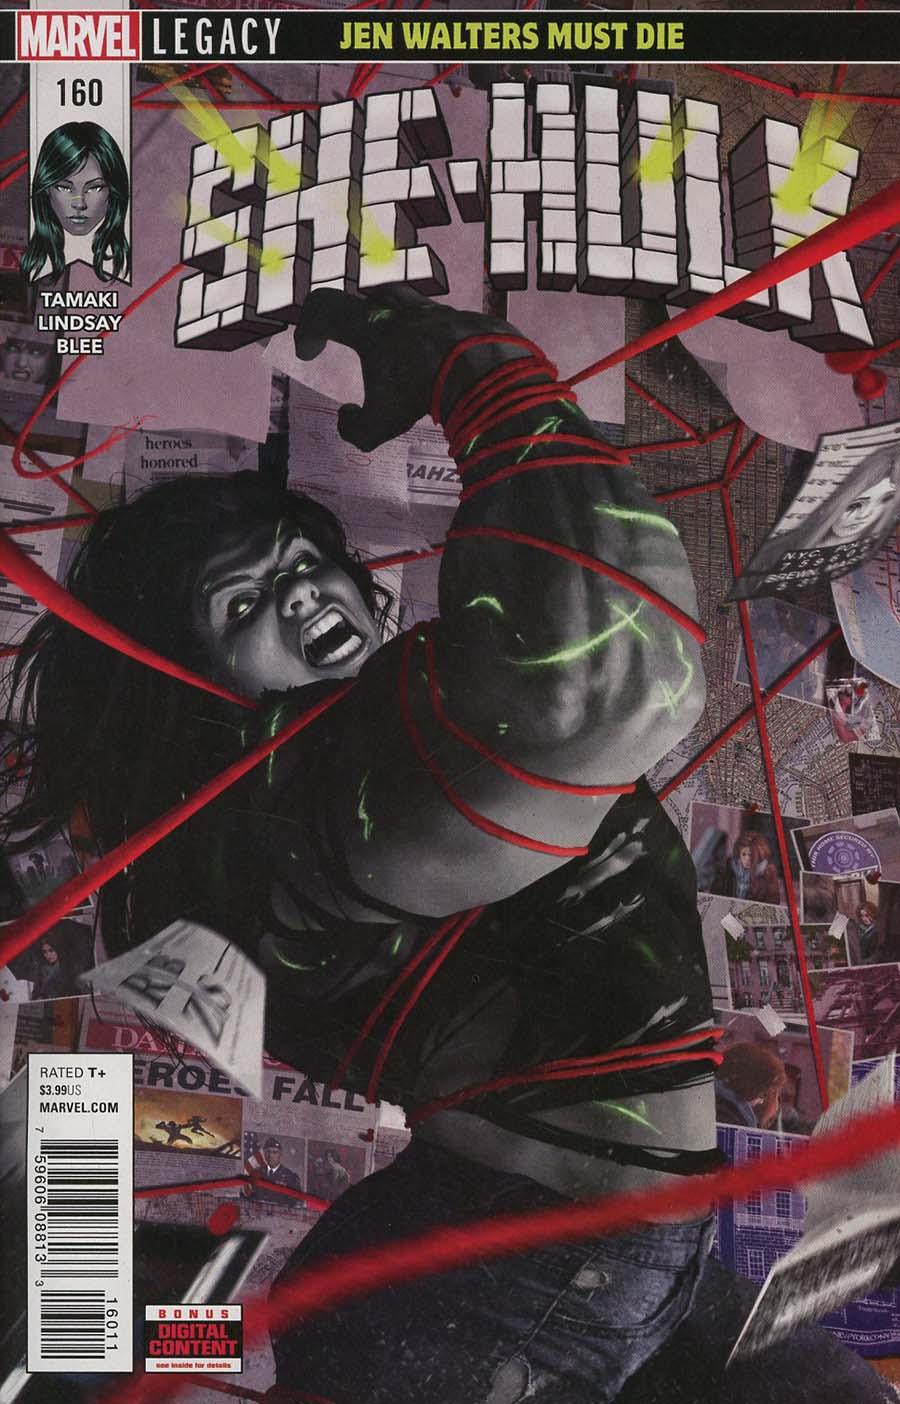 She-Hulk Vol 3 #160 Cover A Regular Rahzzah Cover (Marvel Legacy Tie-In)